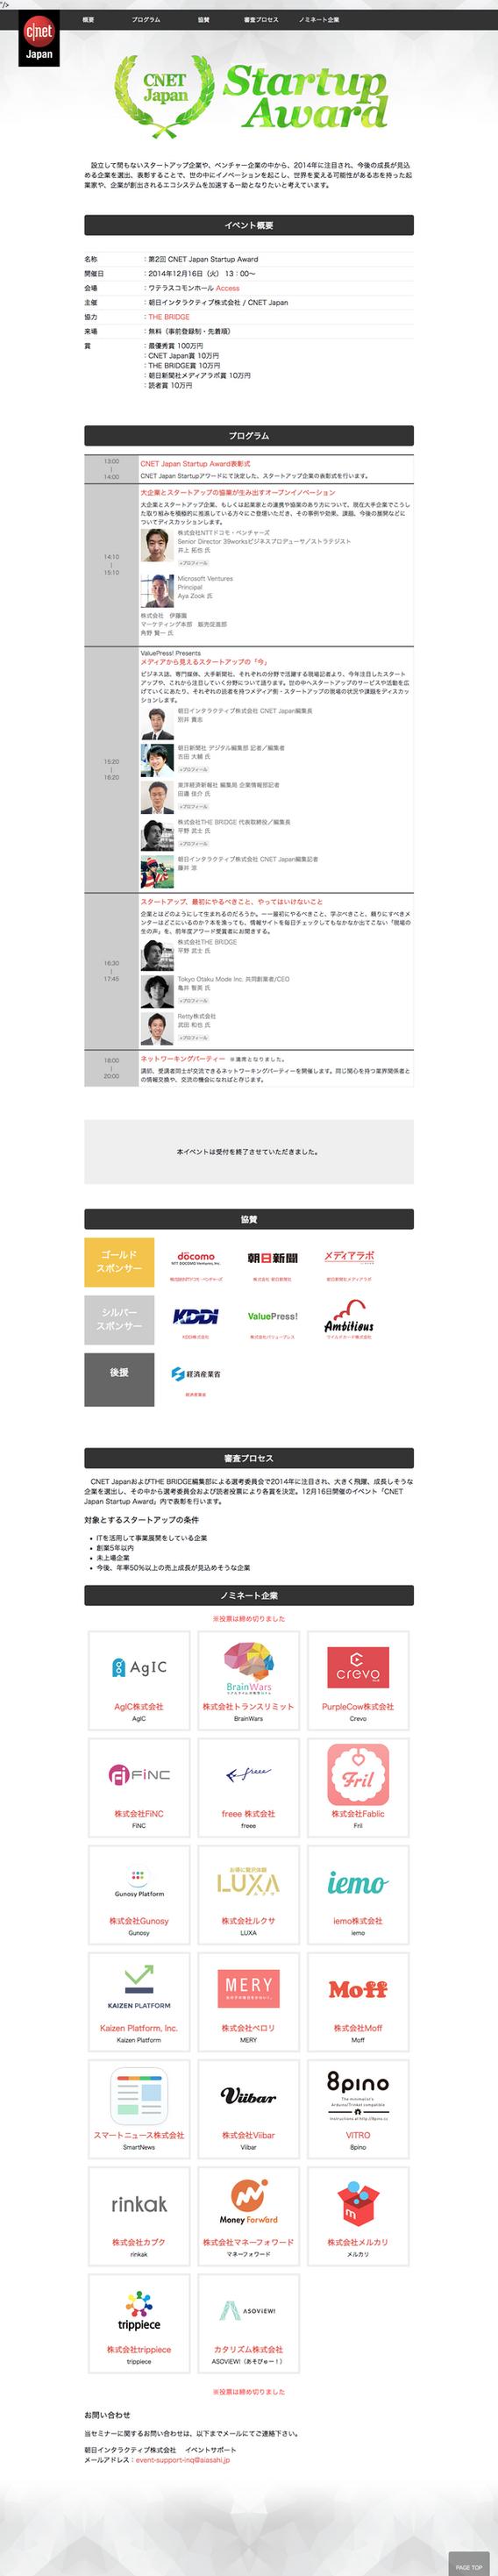 screencapture-japan-cnet-info-event-live